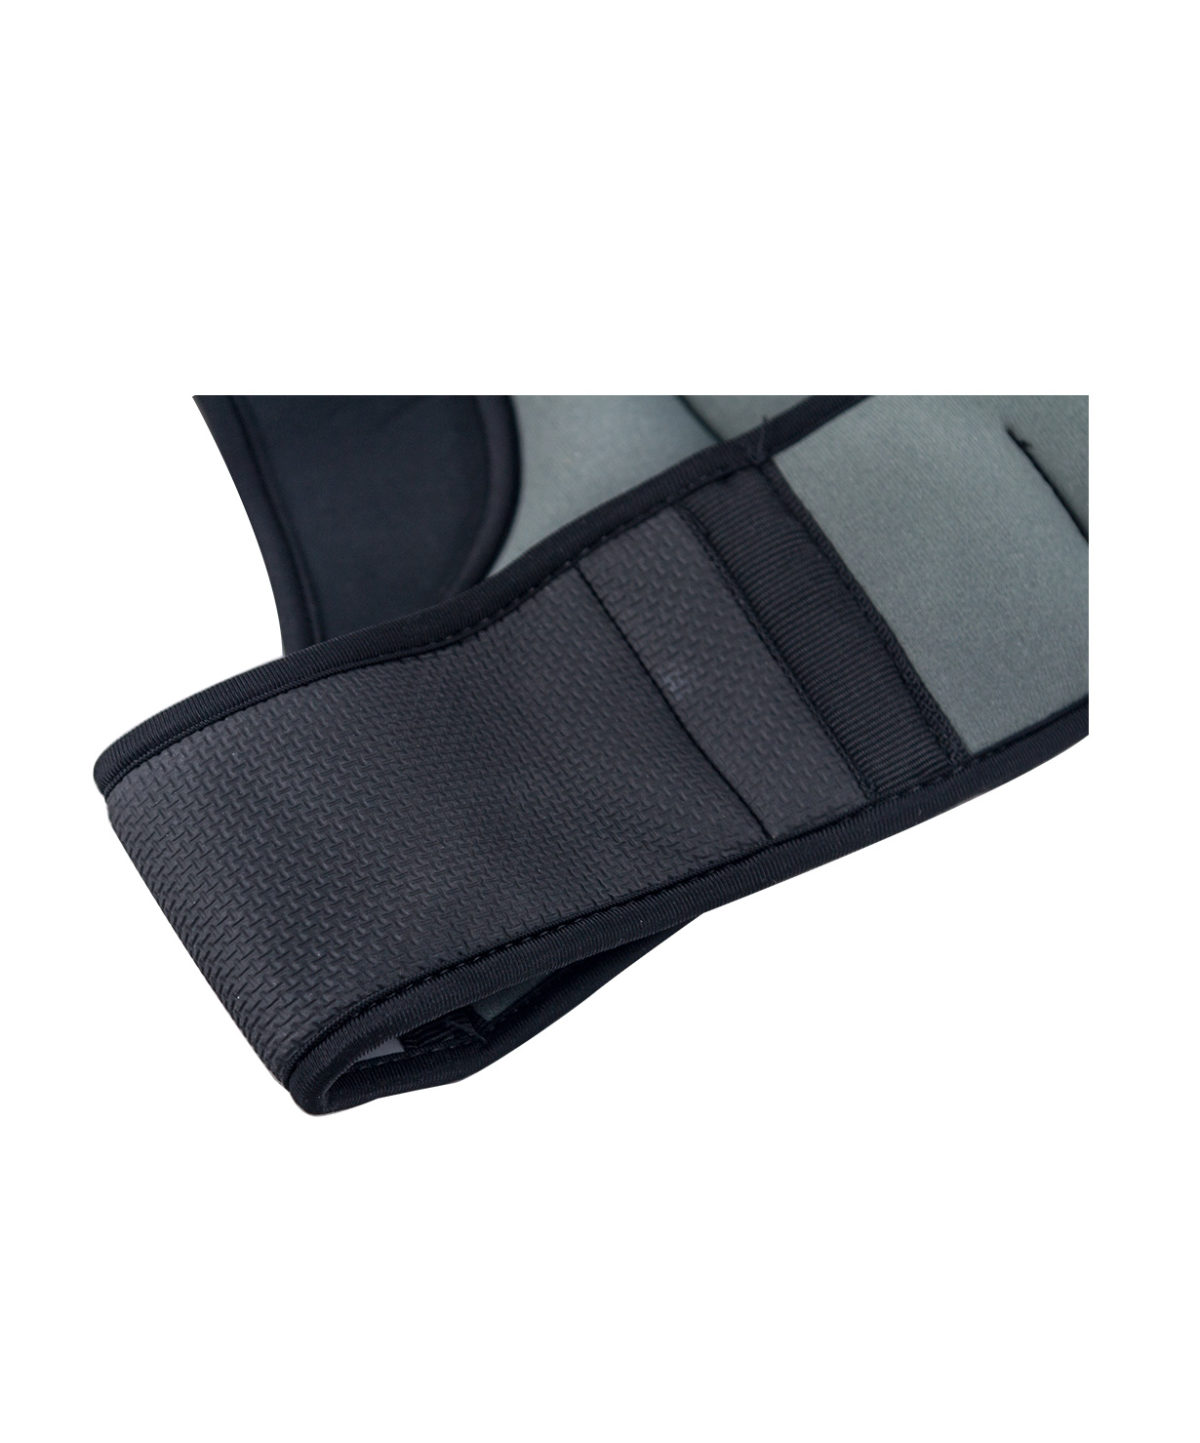 STARFIT Жилет-утяжелитель серый, 5 кг WT-301 - 4